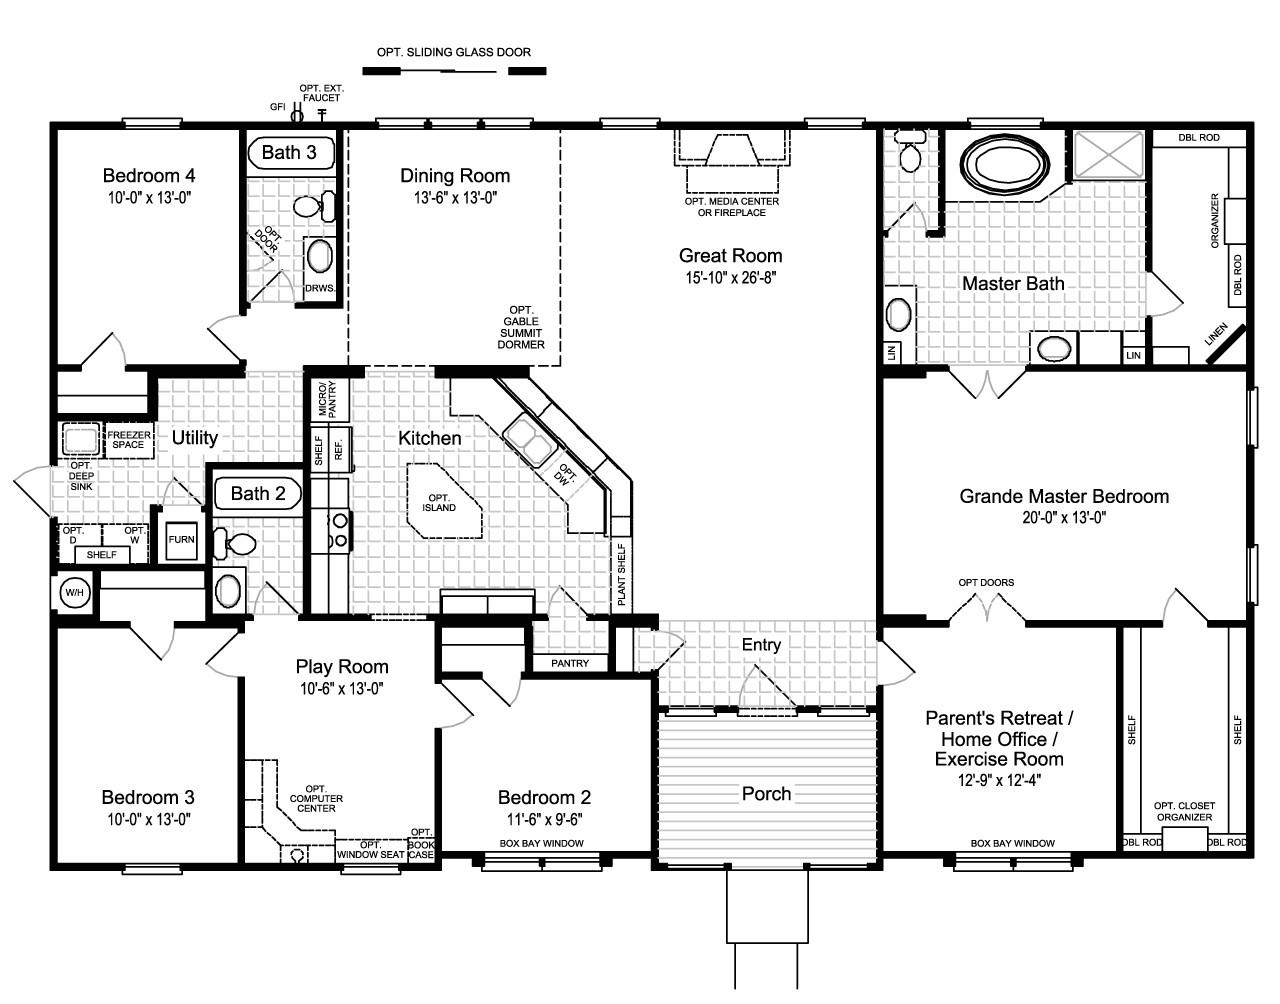 Home Floor Plan the Hacienda Ii Vr41664a Manufactured Home Floor Plan or